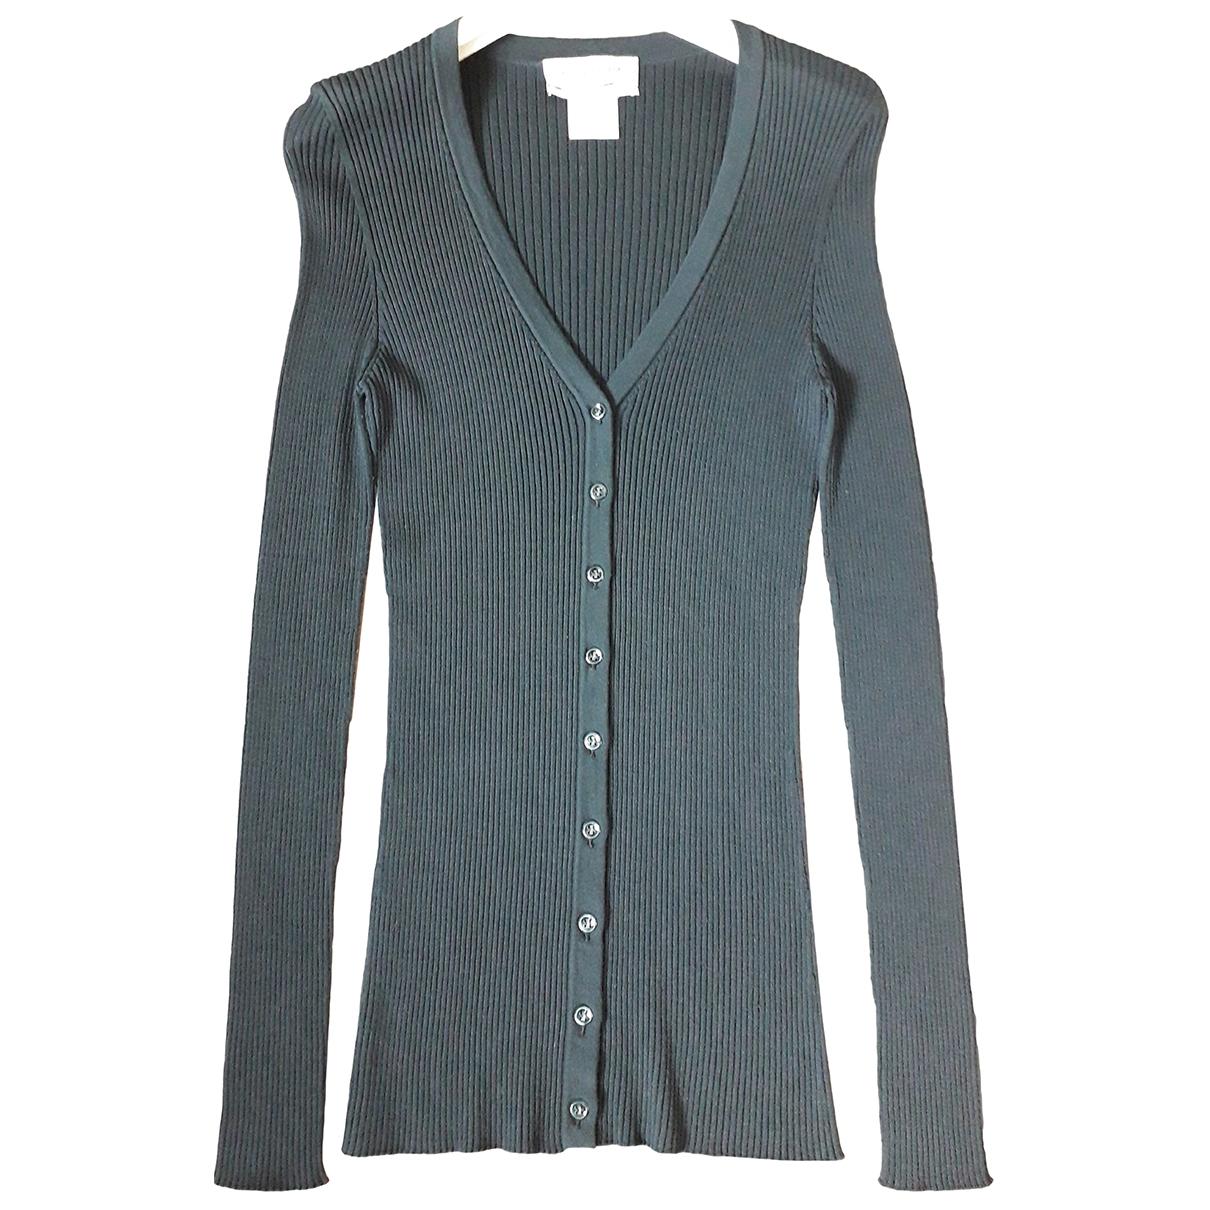 Yves Saint Laurent \N Pullover in  Gruen Wolle